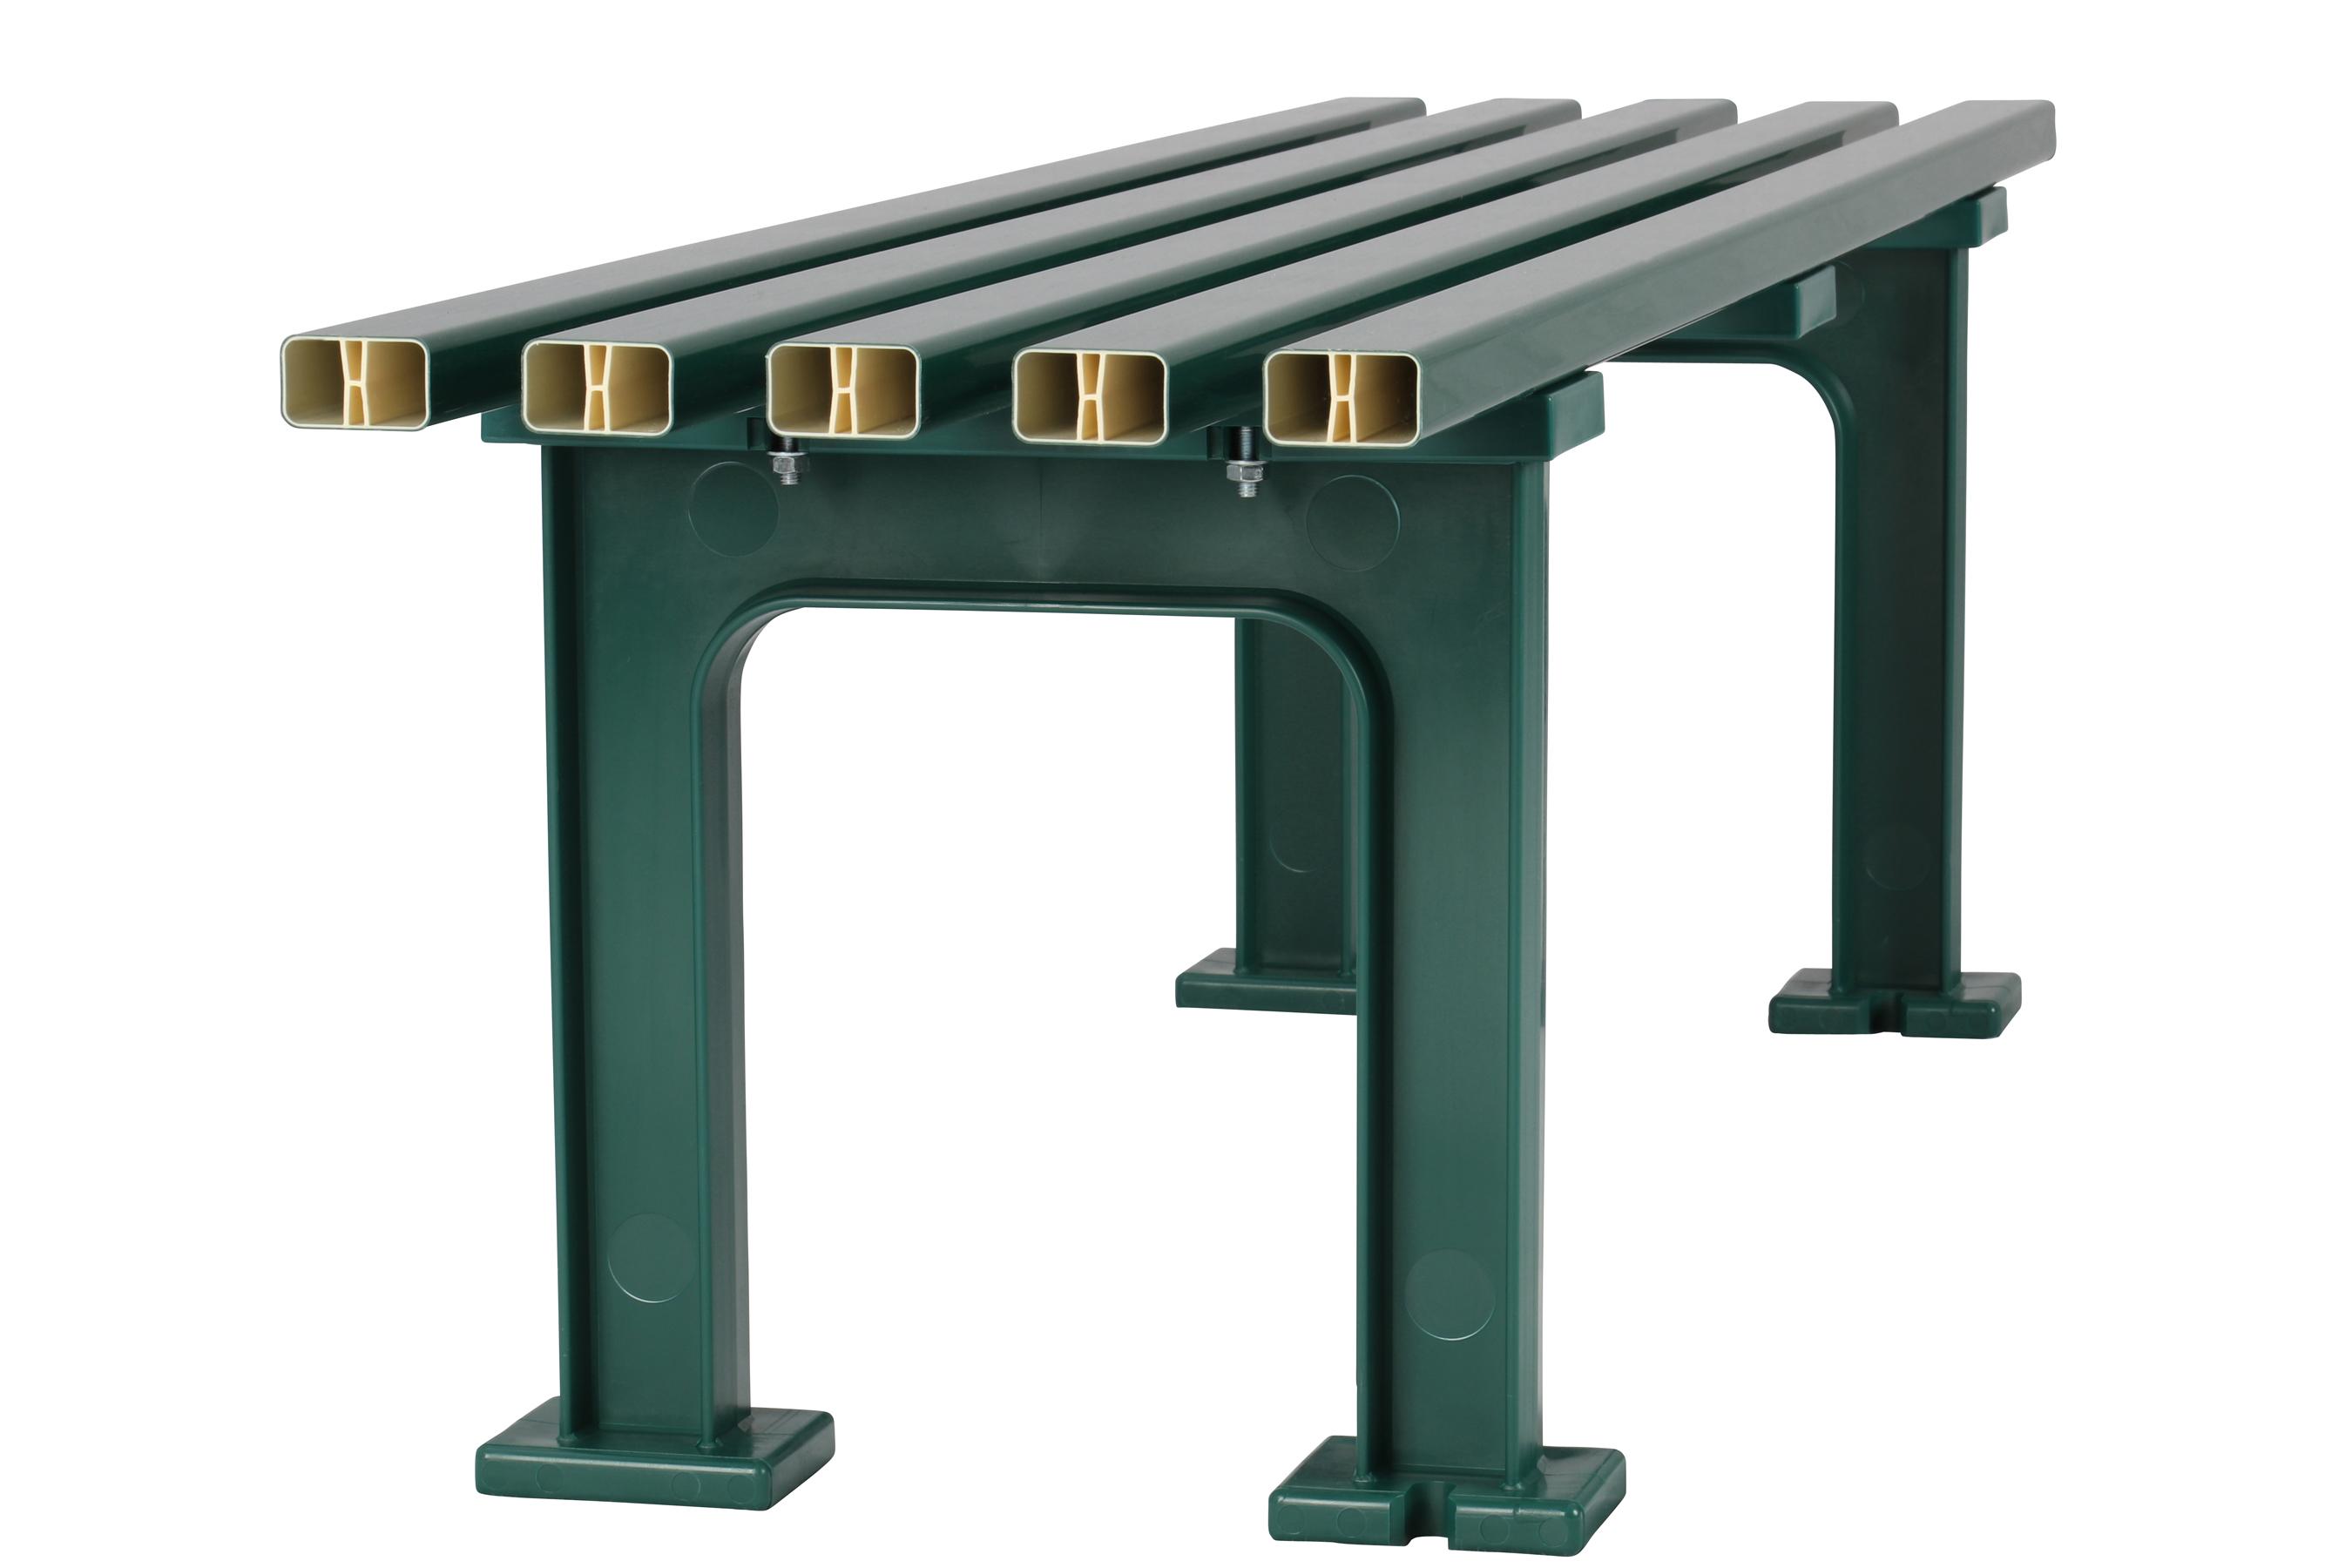 Blome Gartenbank / 3-Sitzer Bank Mono I Kunststoff grün 150cm Bild 4